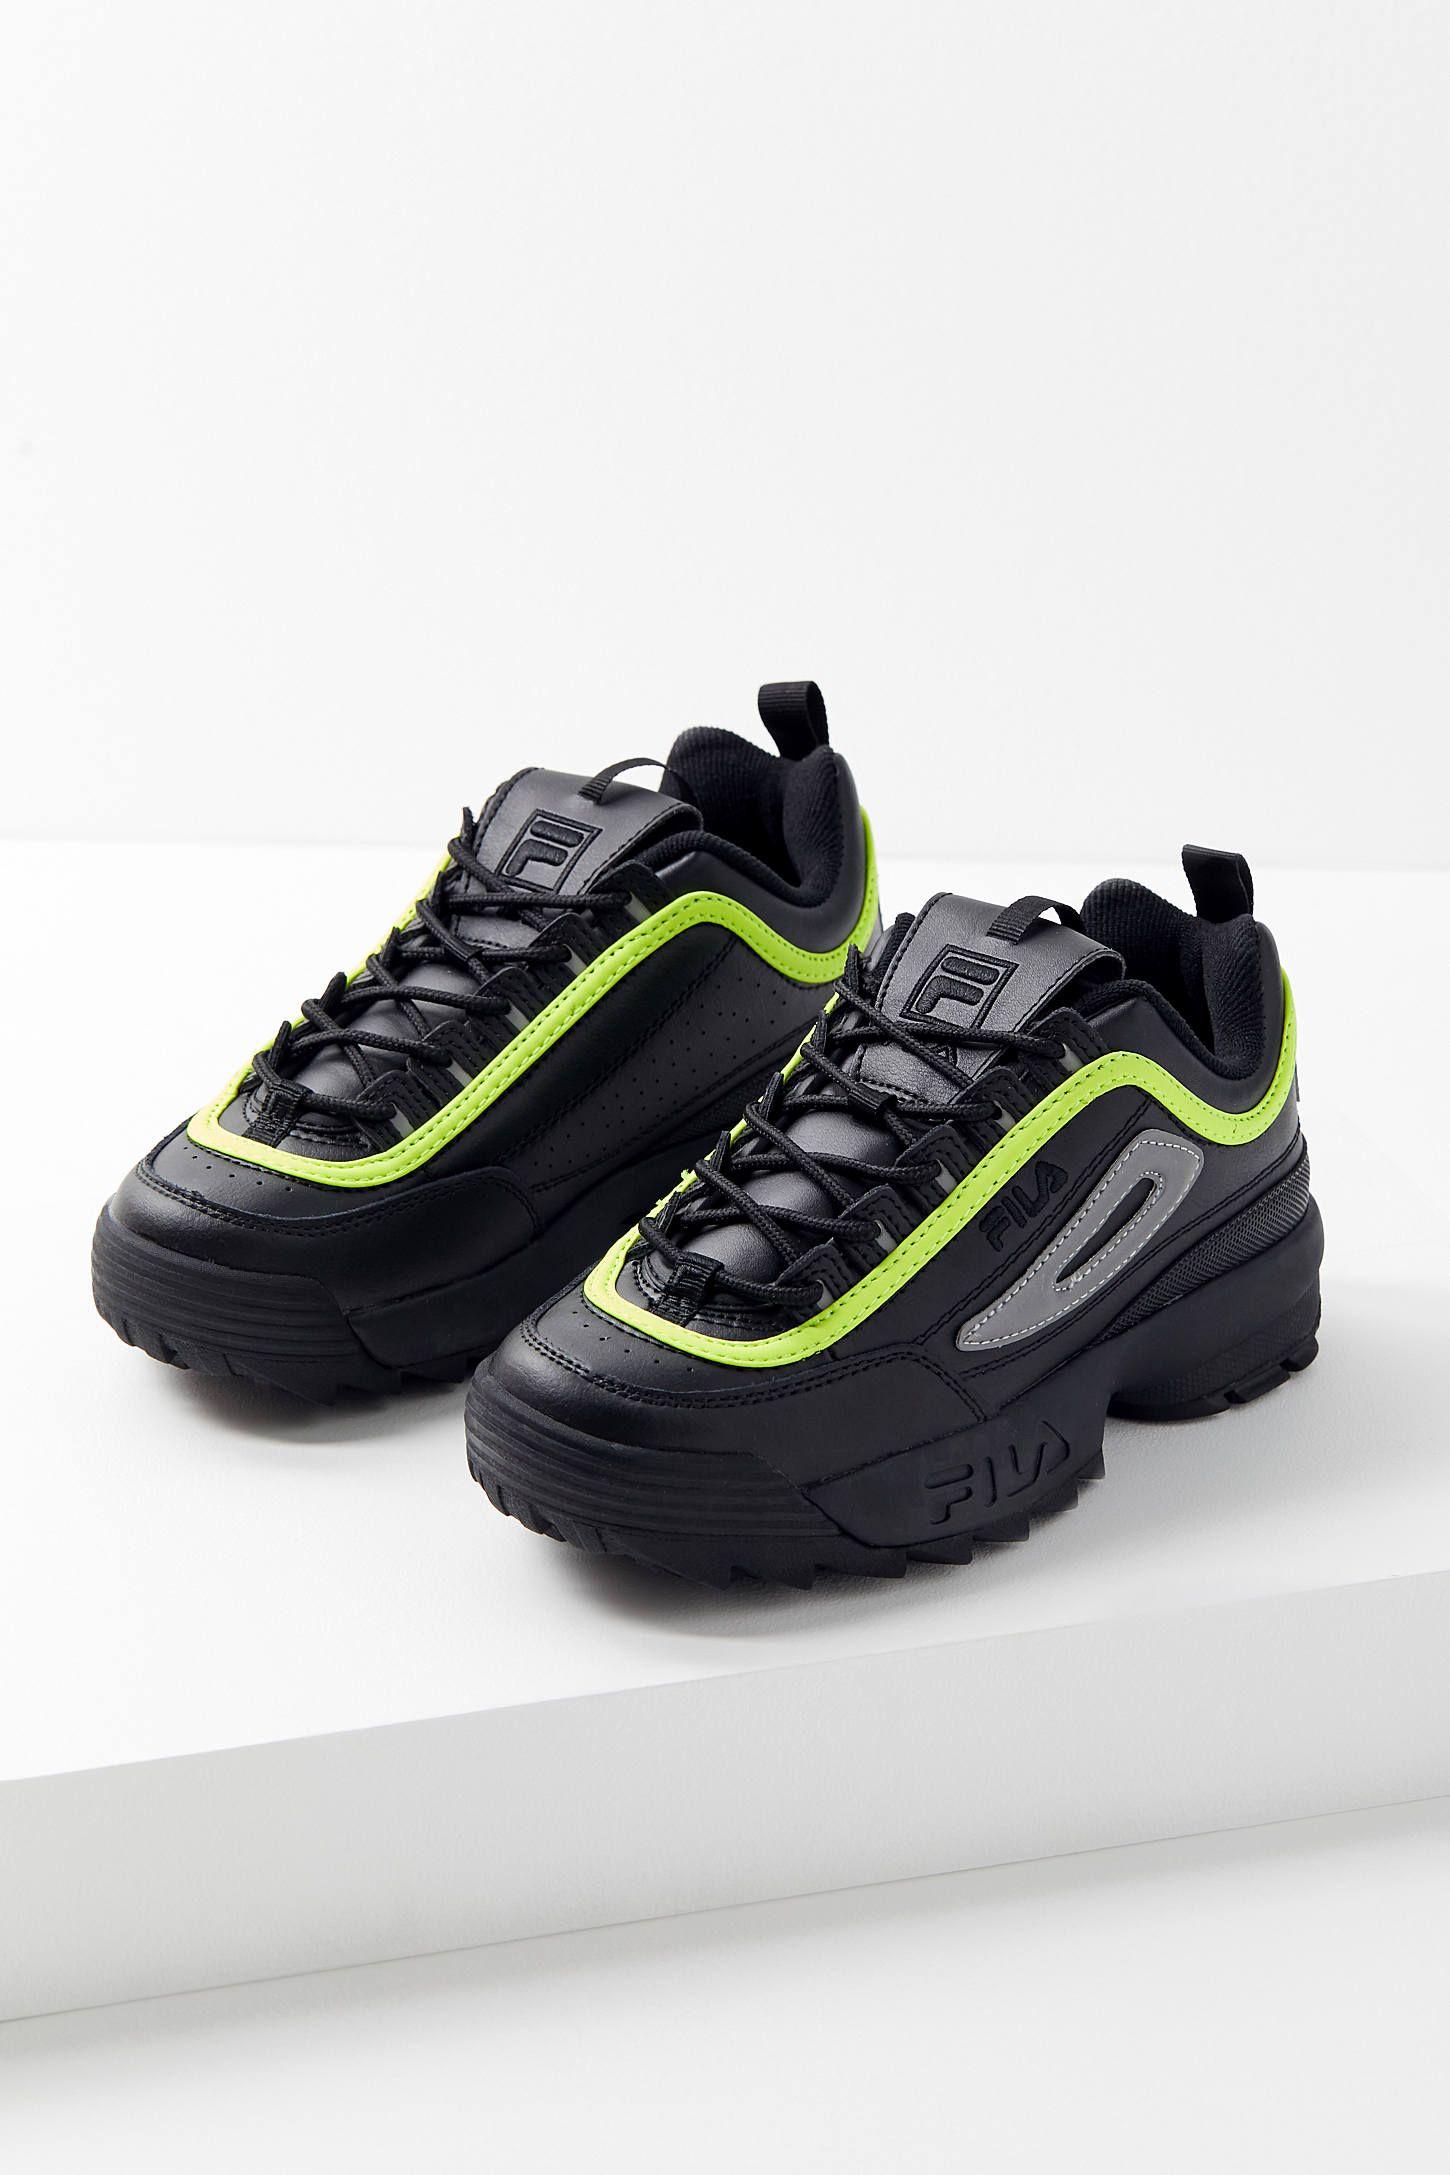 FILA Disruptor 2 Premium Neon Sneaker | Neon sneakers